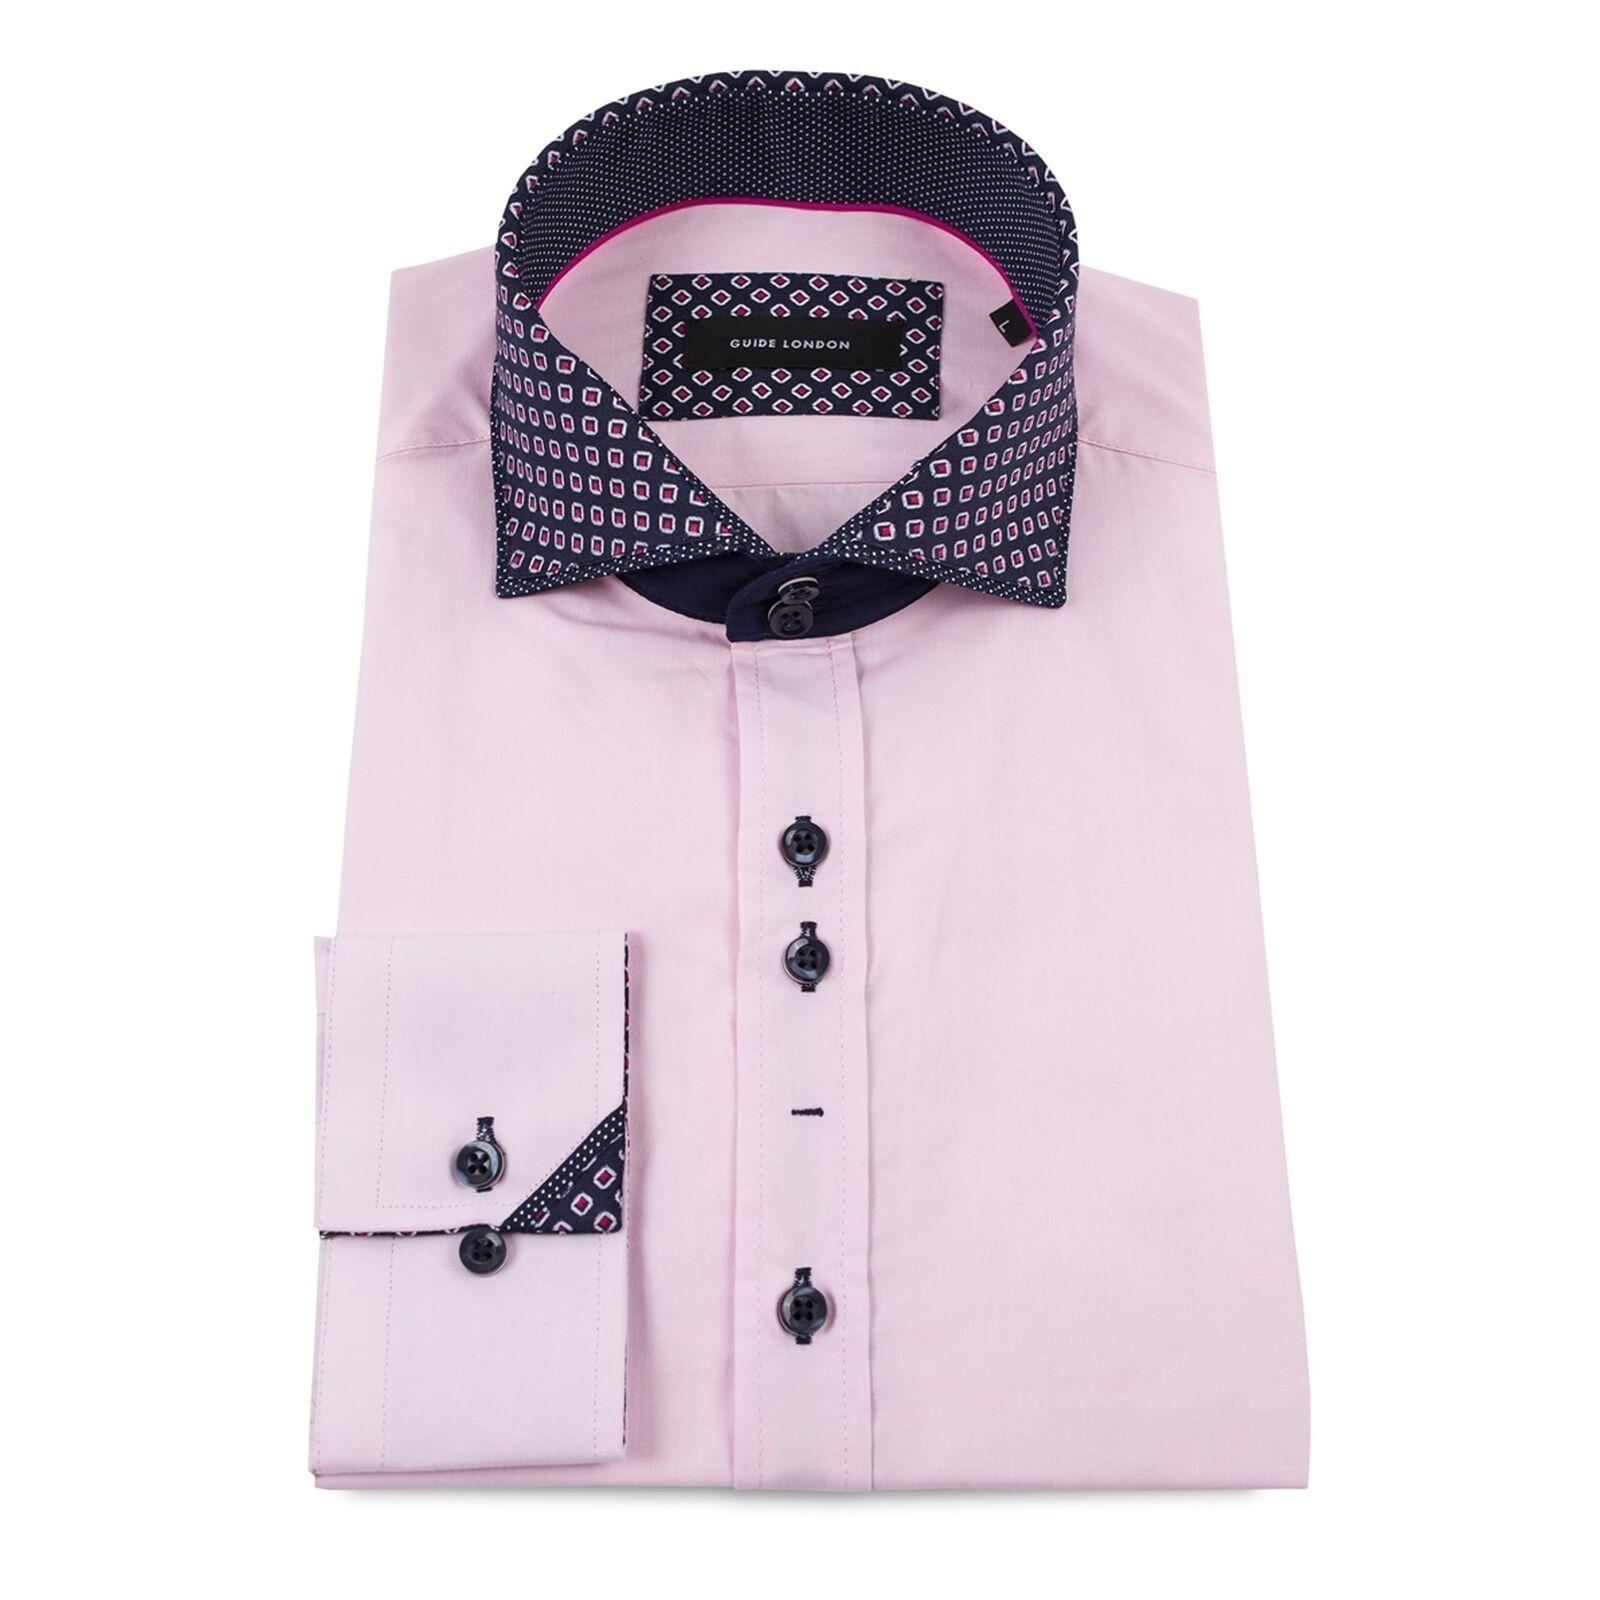 Guide London Layered Print Collar Pink Mens Shirt